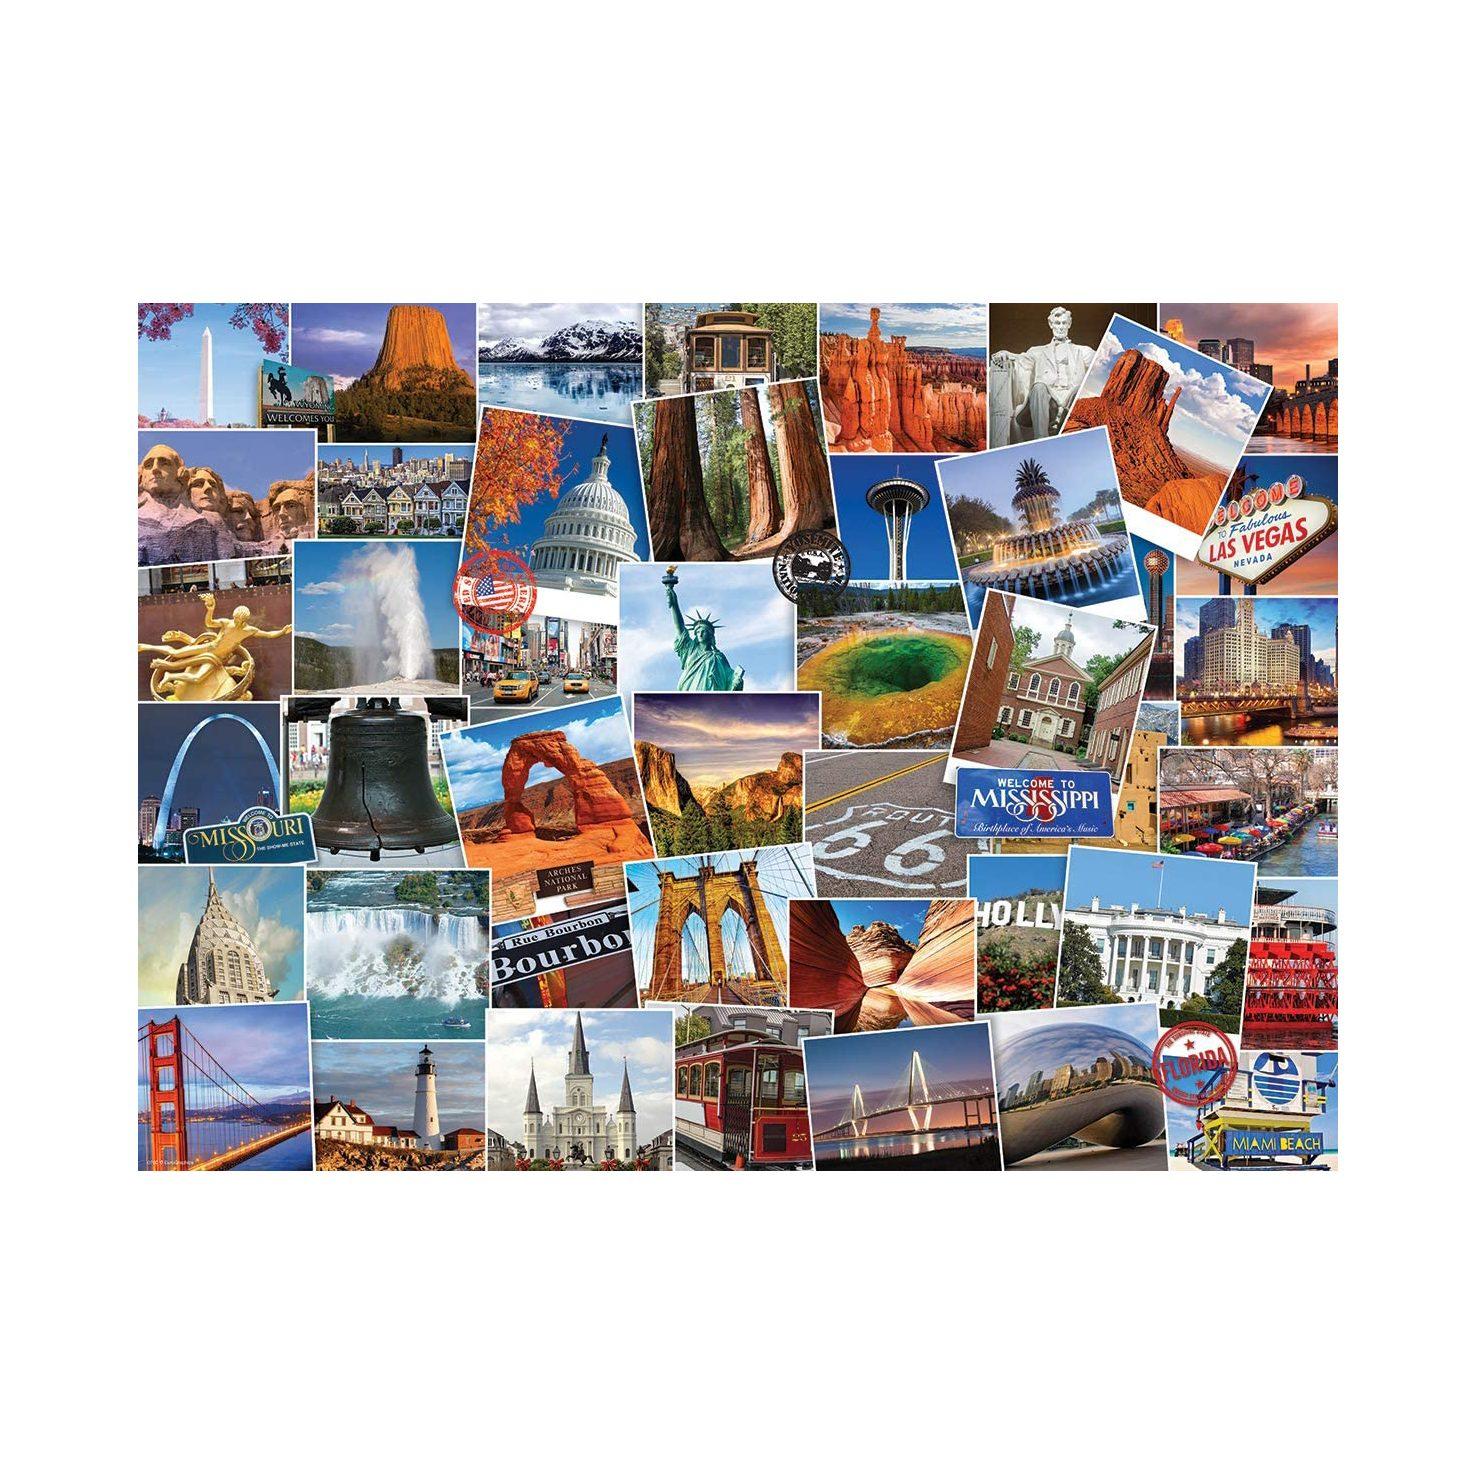 EuroGraphics USA Globetrotter 1,000-Piece Jigsaw Puzzle